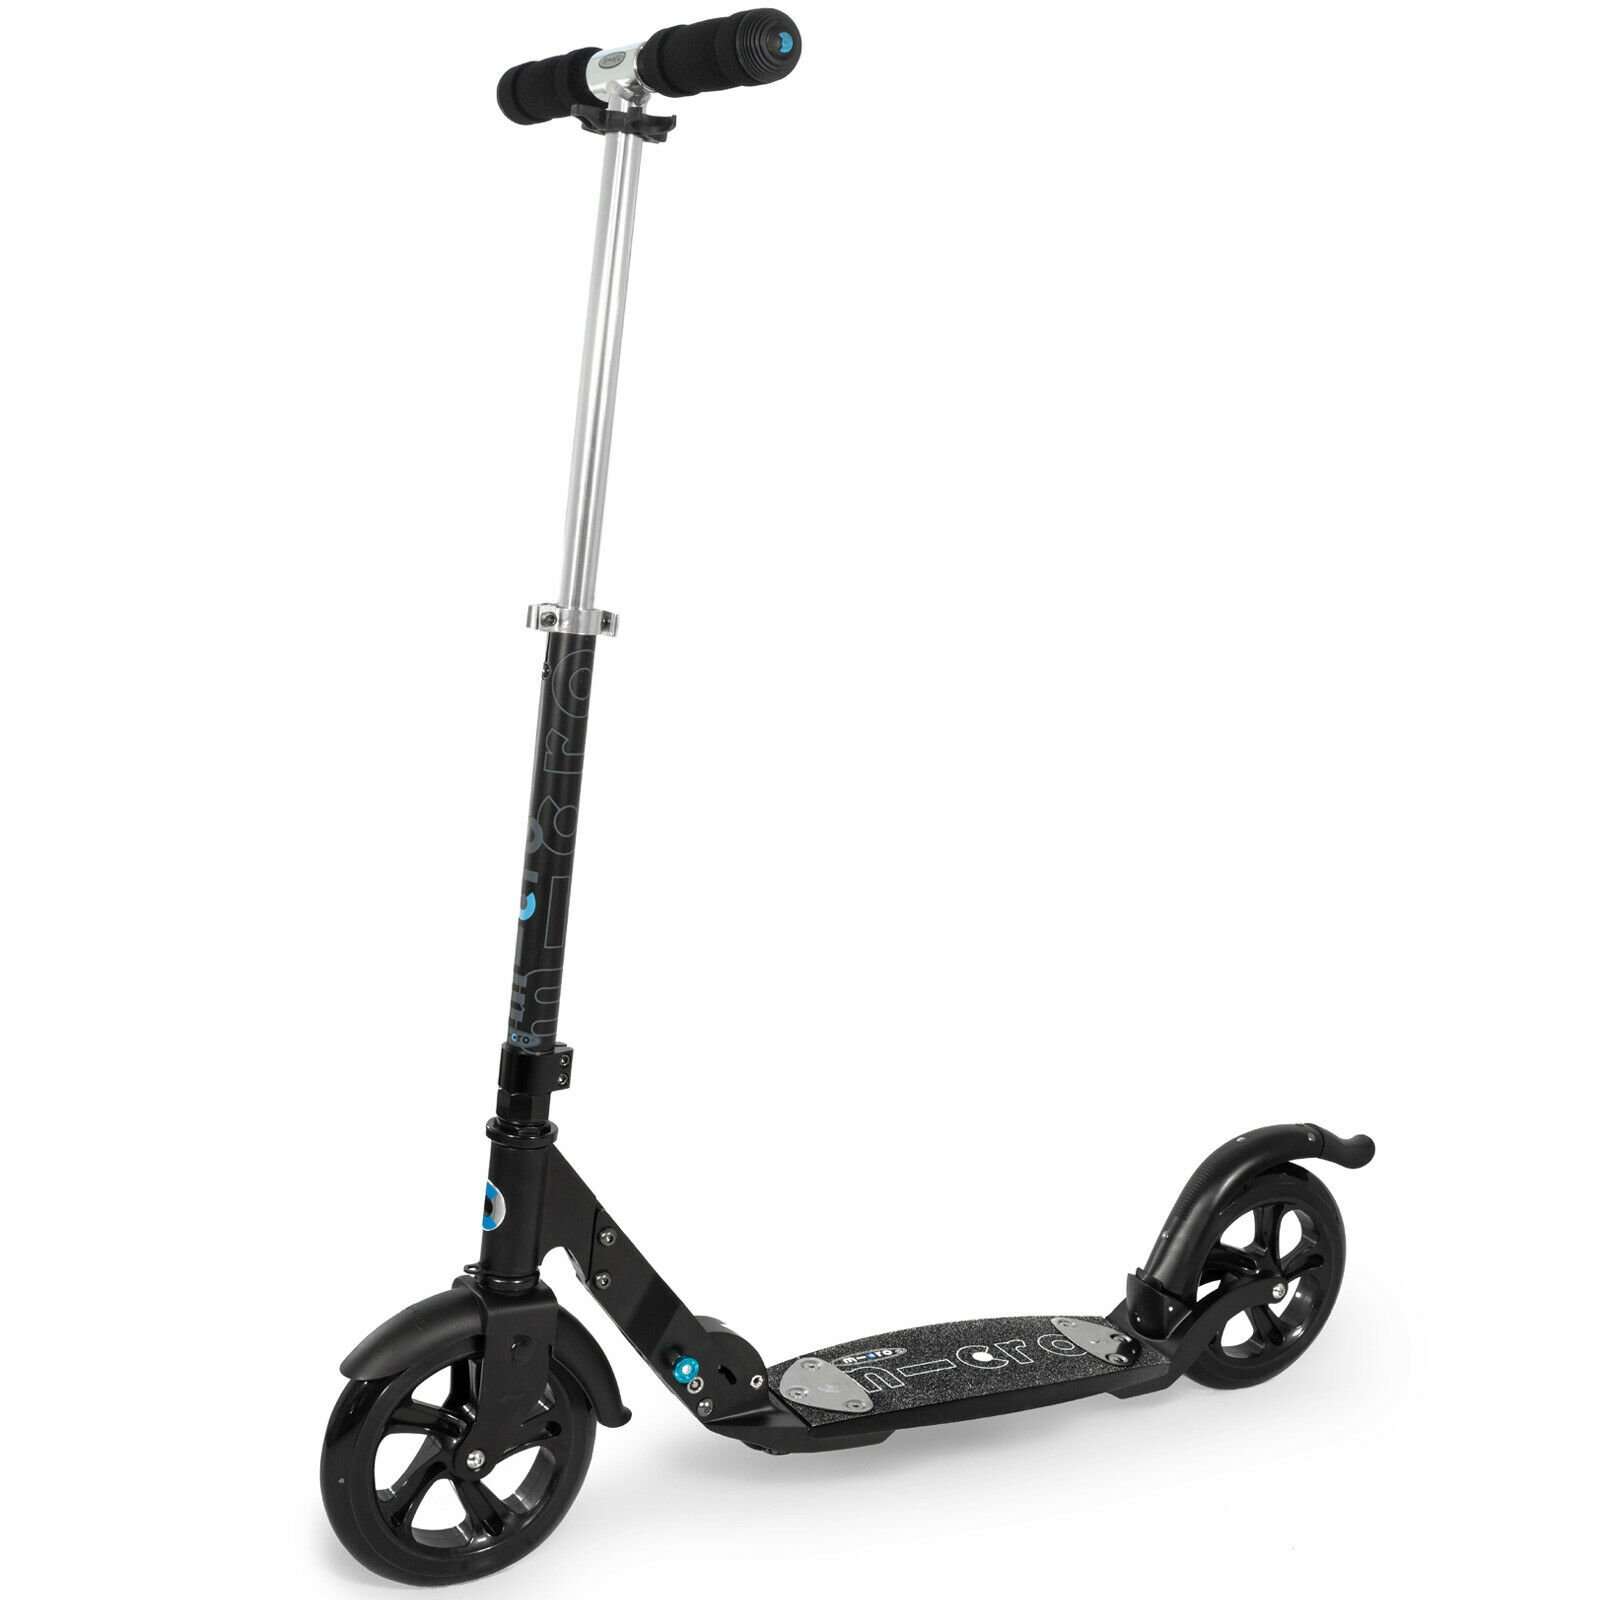 Micro - Flex 200 Scooter - Black Matt (SA0119)